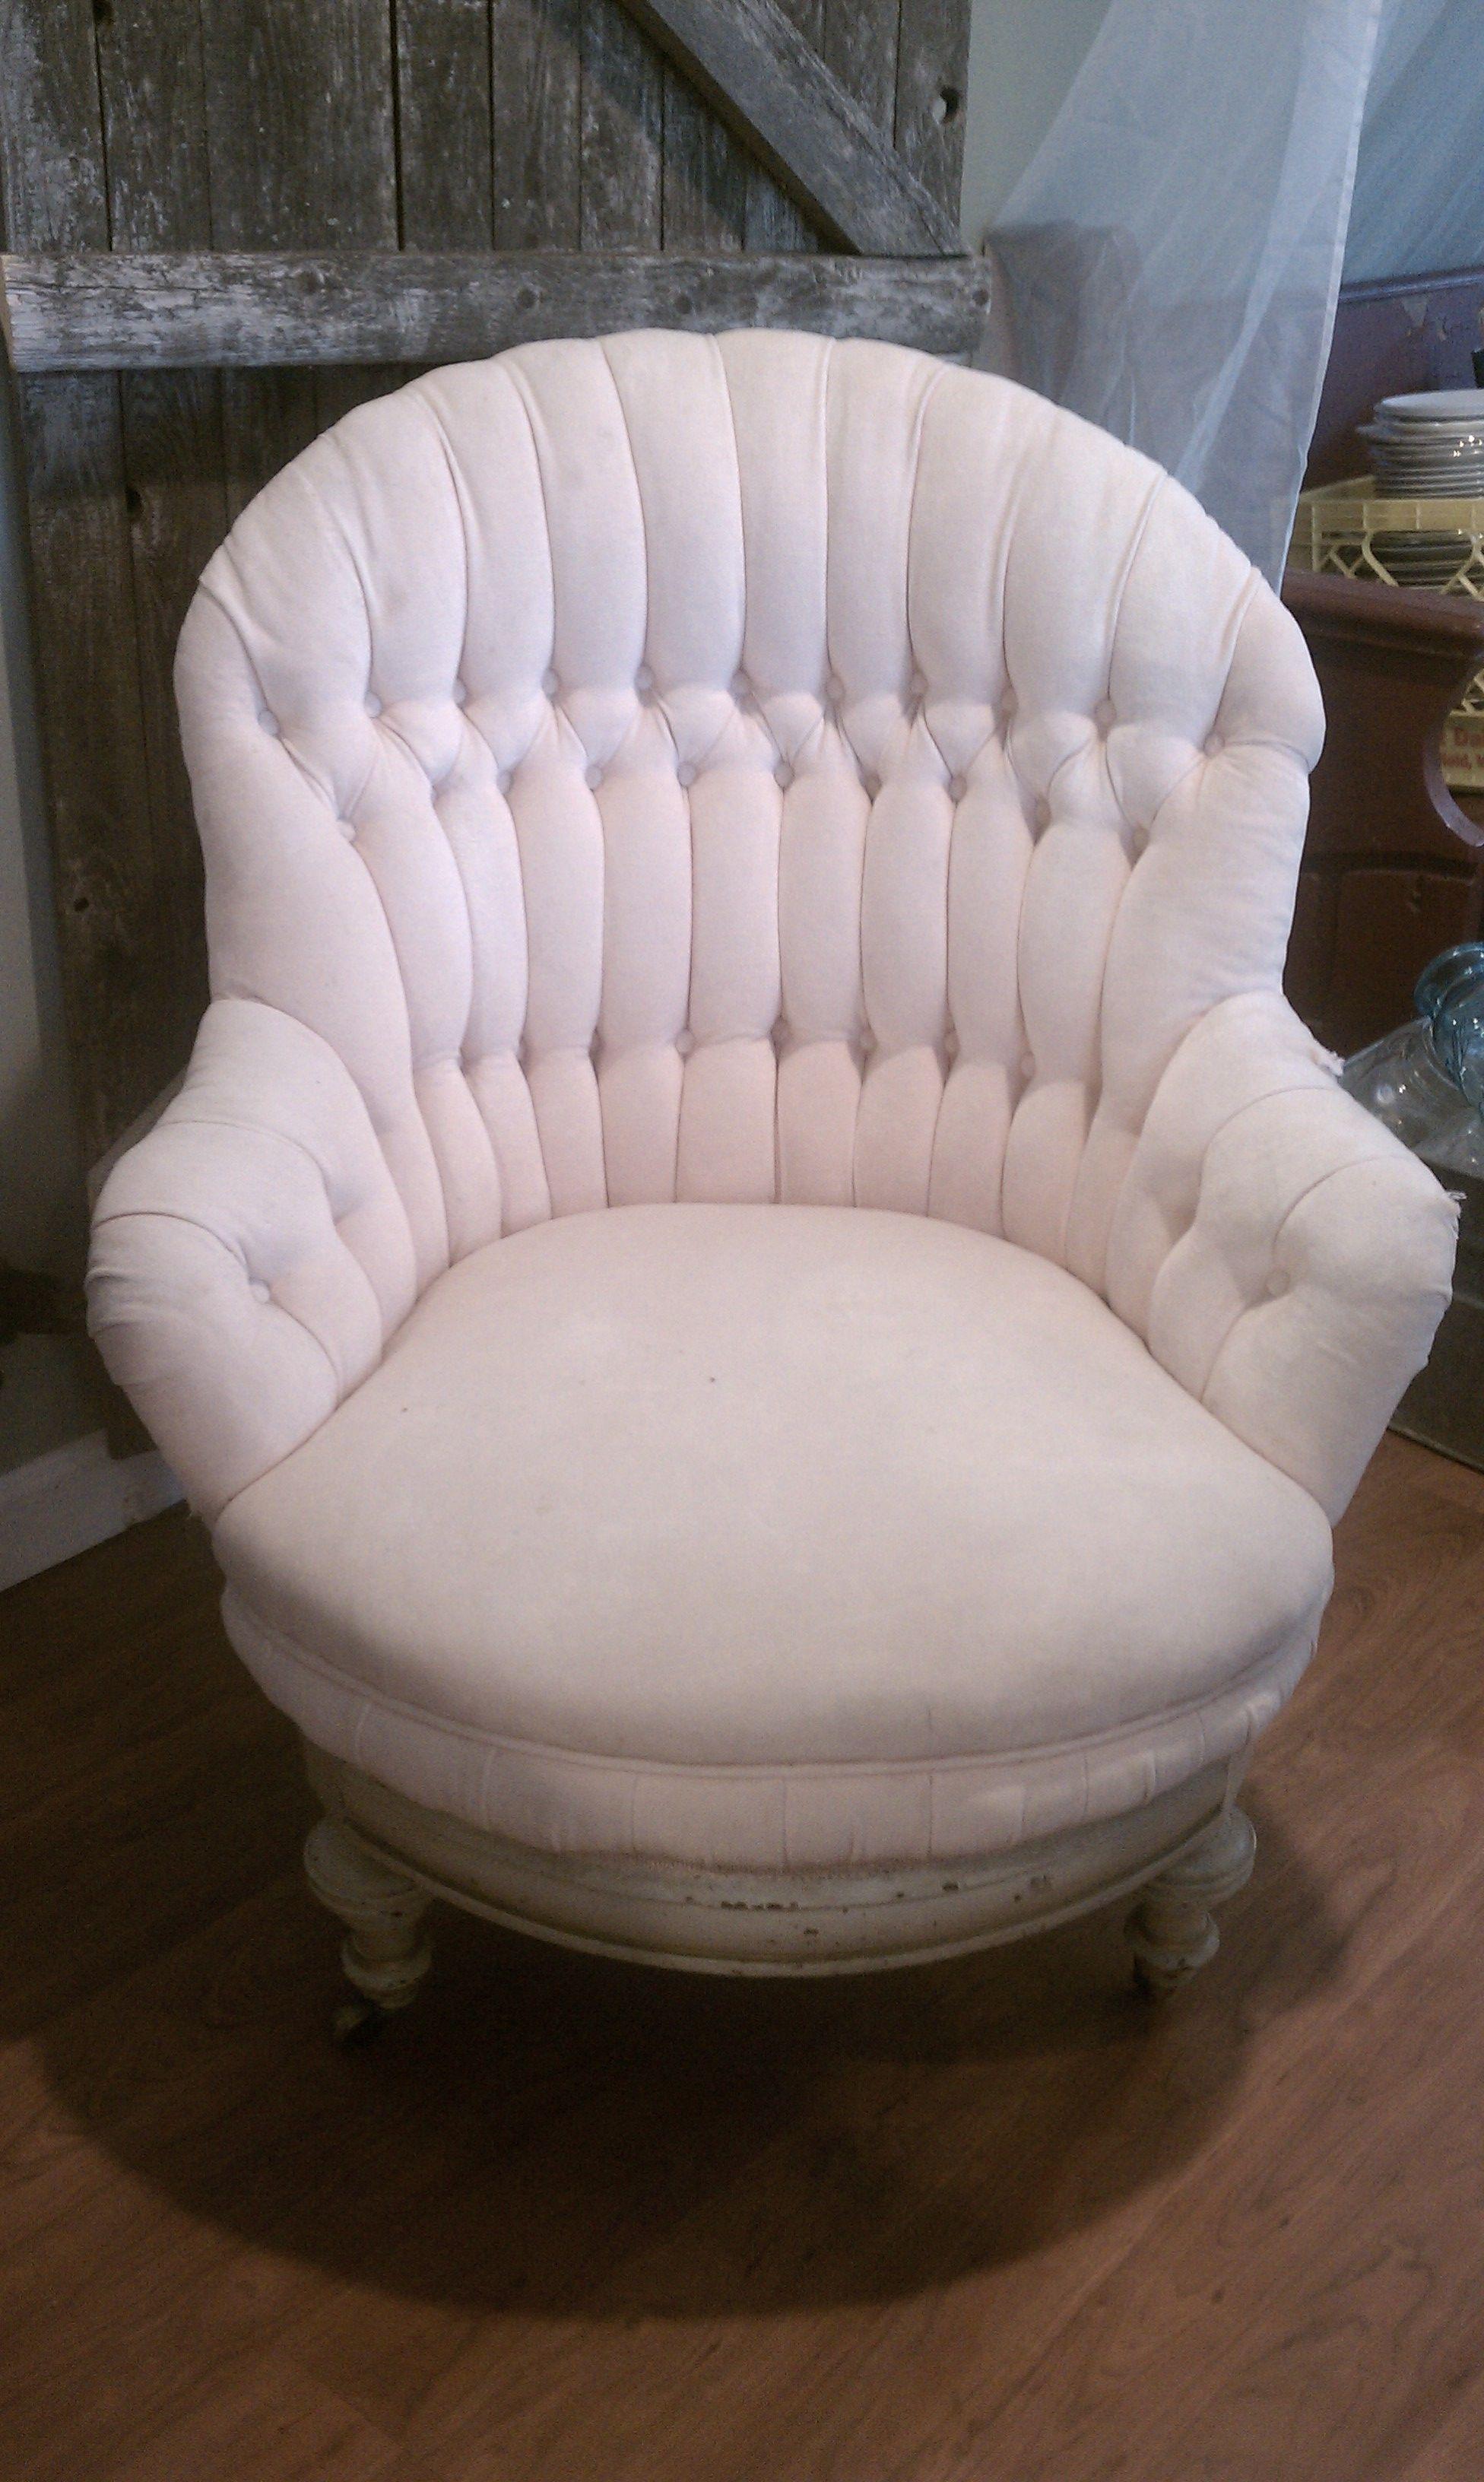 baby shower chair rentals ct | http://atwebry | pinterest